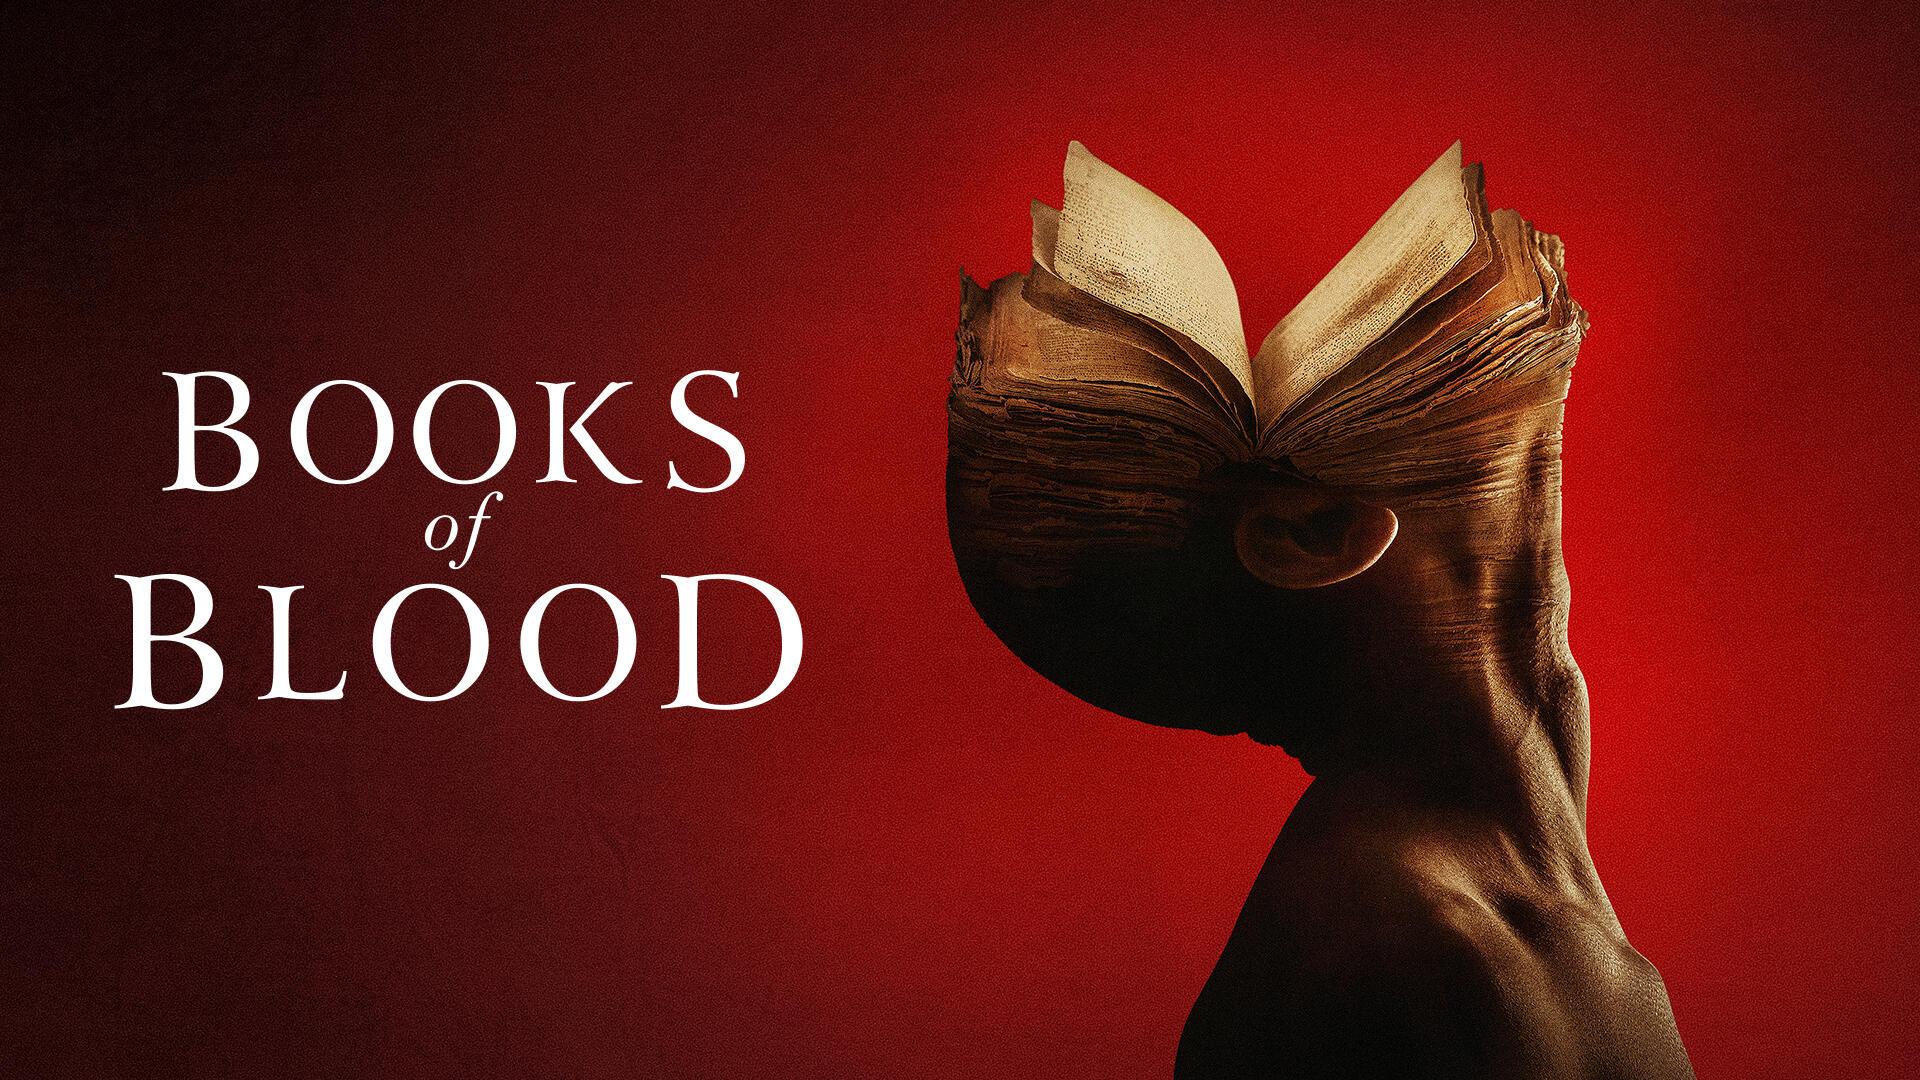 Books_Of_Blood_16x9